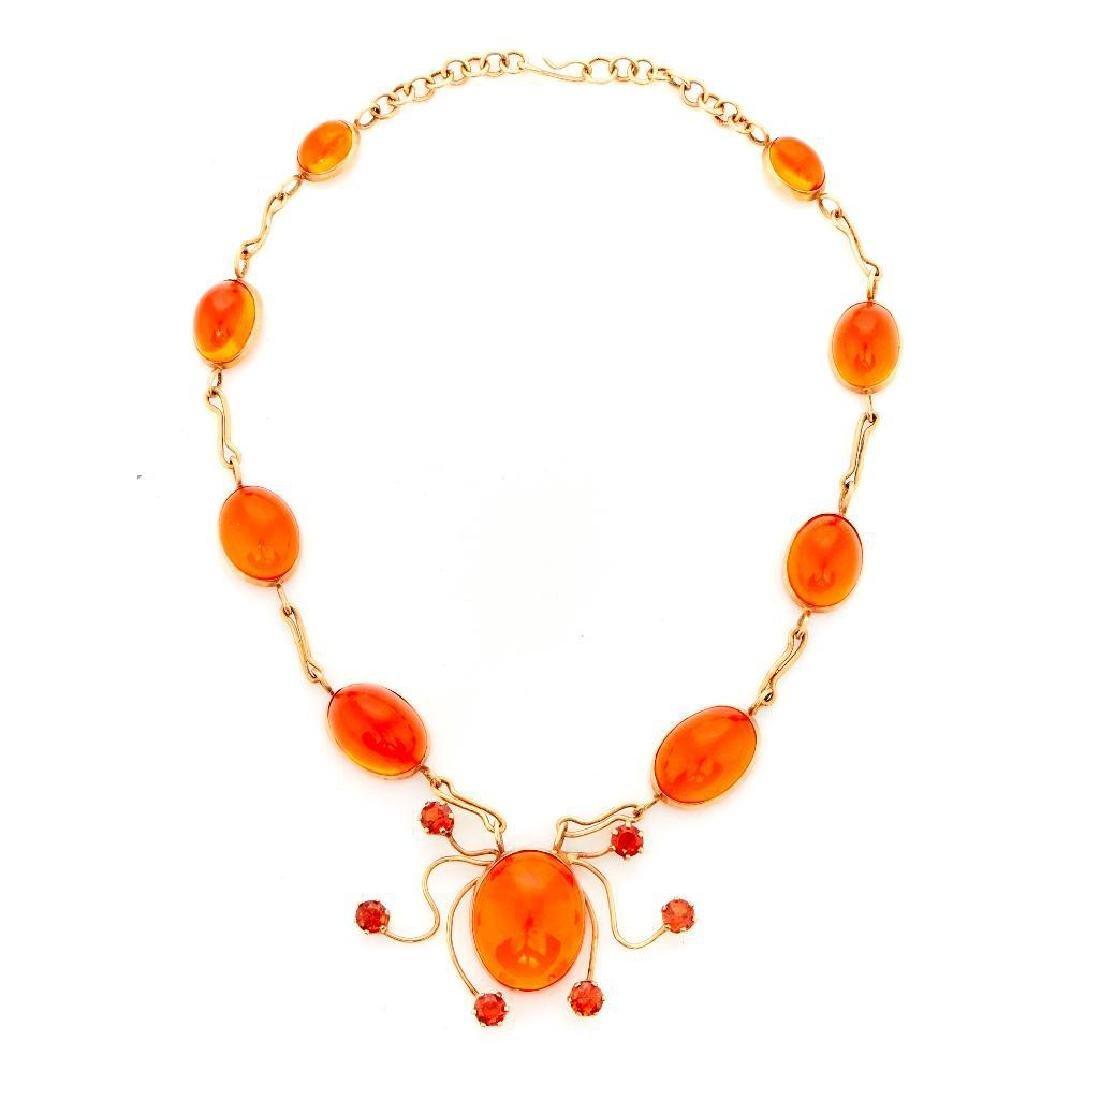 14k gold and orange stone necklace